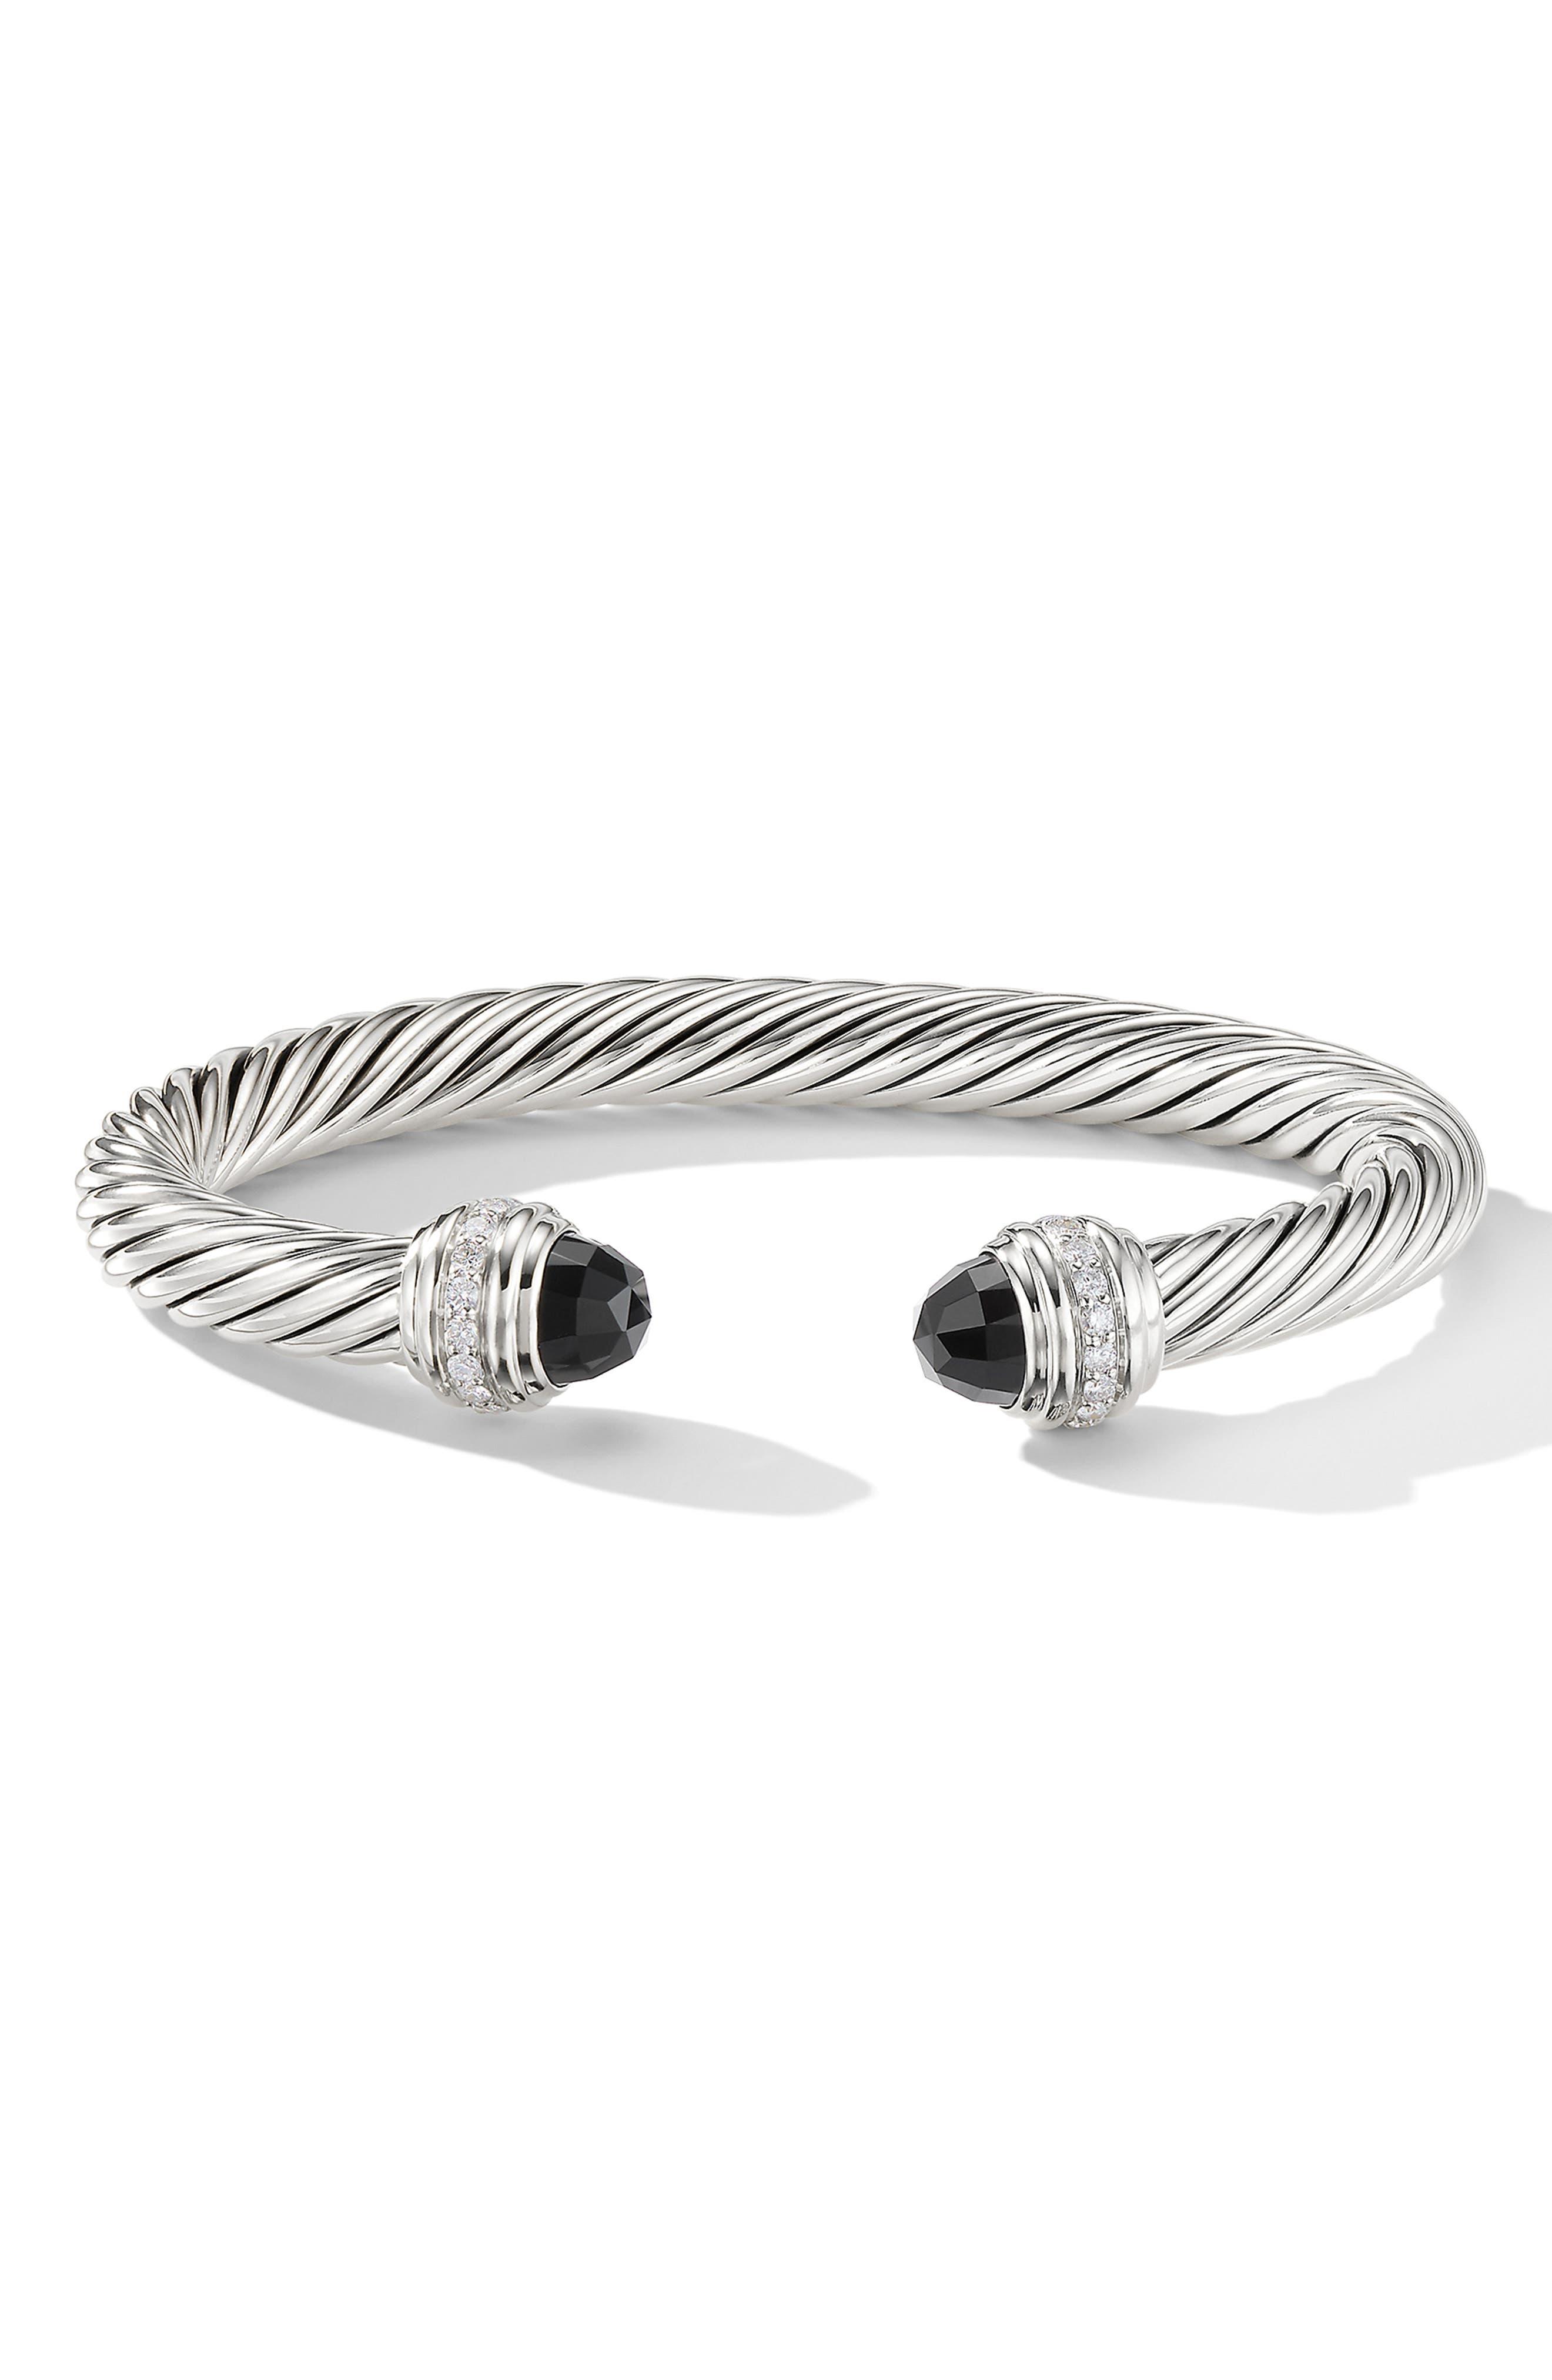 Cable Classics Bracelet with Semiprecious Stones & Diamonds, 7mm,                             Alternate thumbnail 2, color,                             SILVER/ DIAMOND/ BLACK ONYX